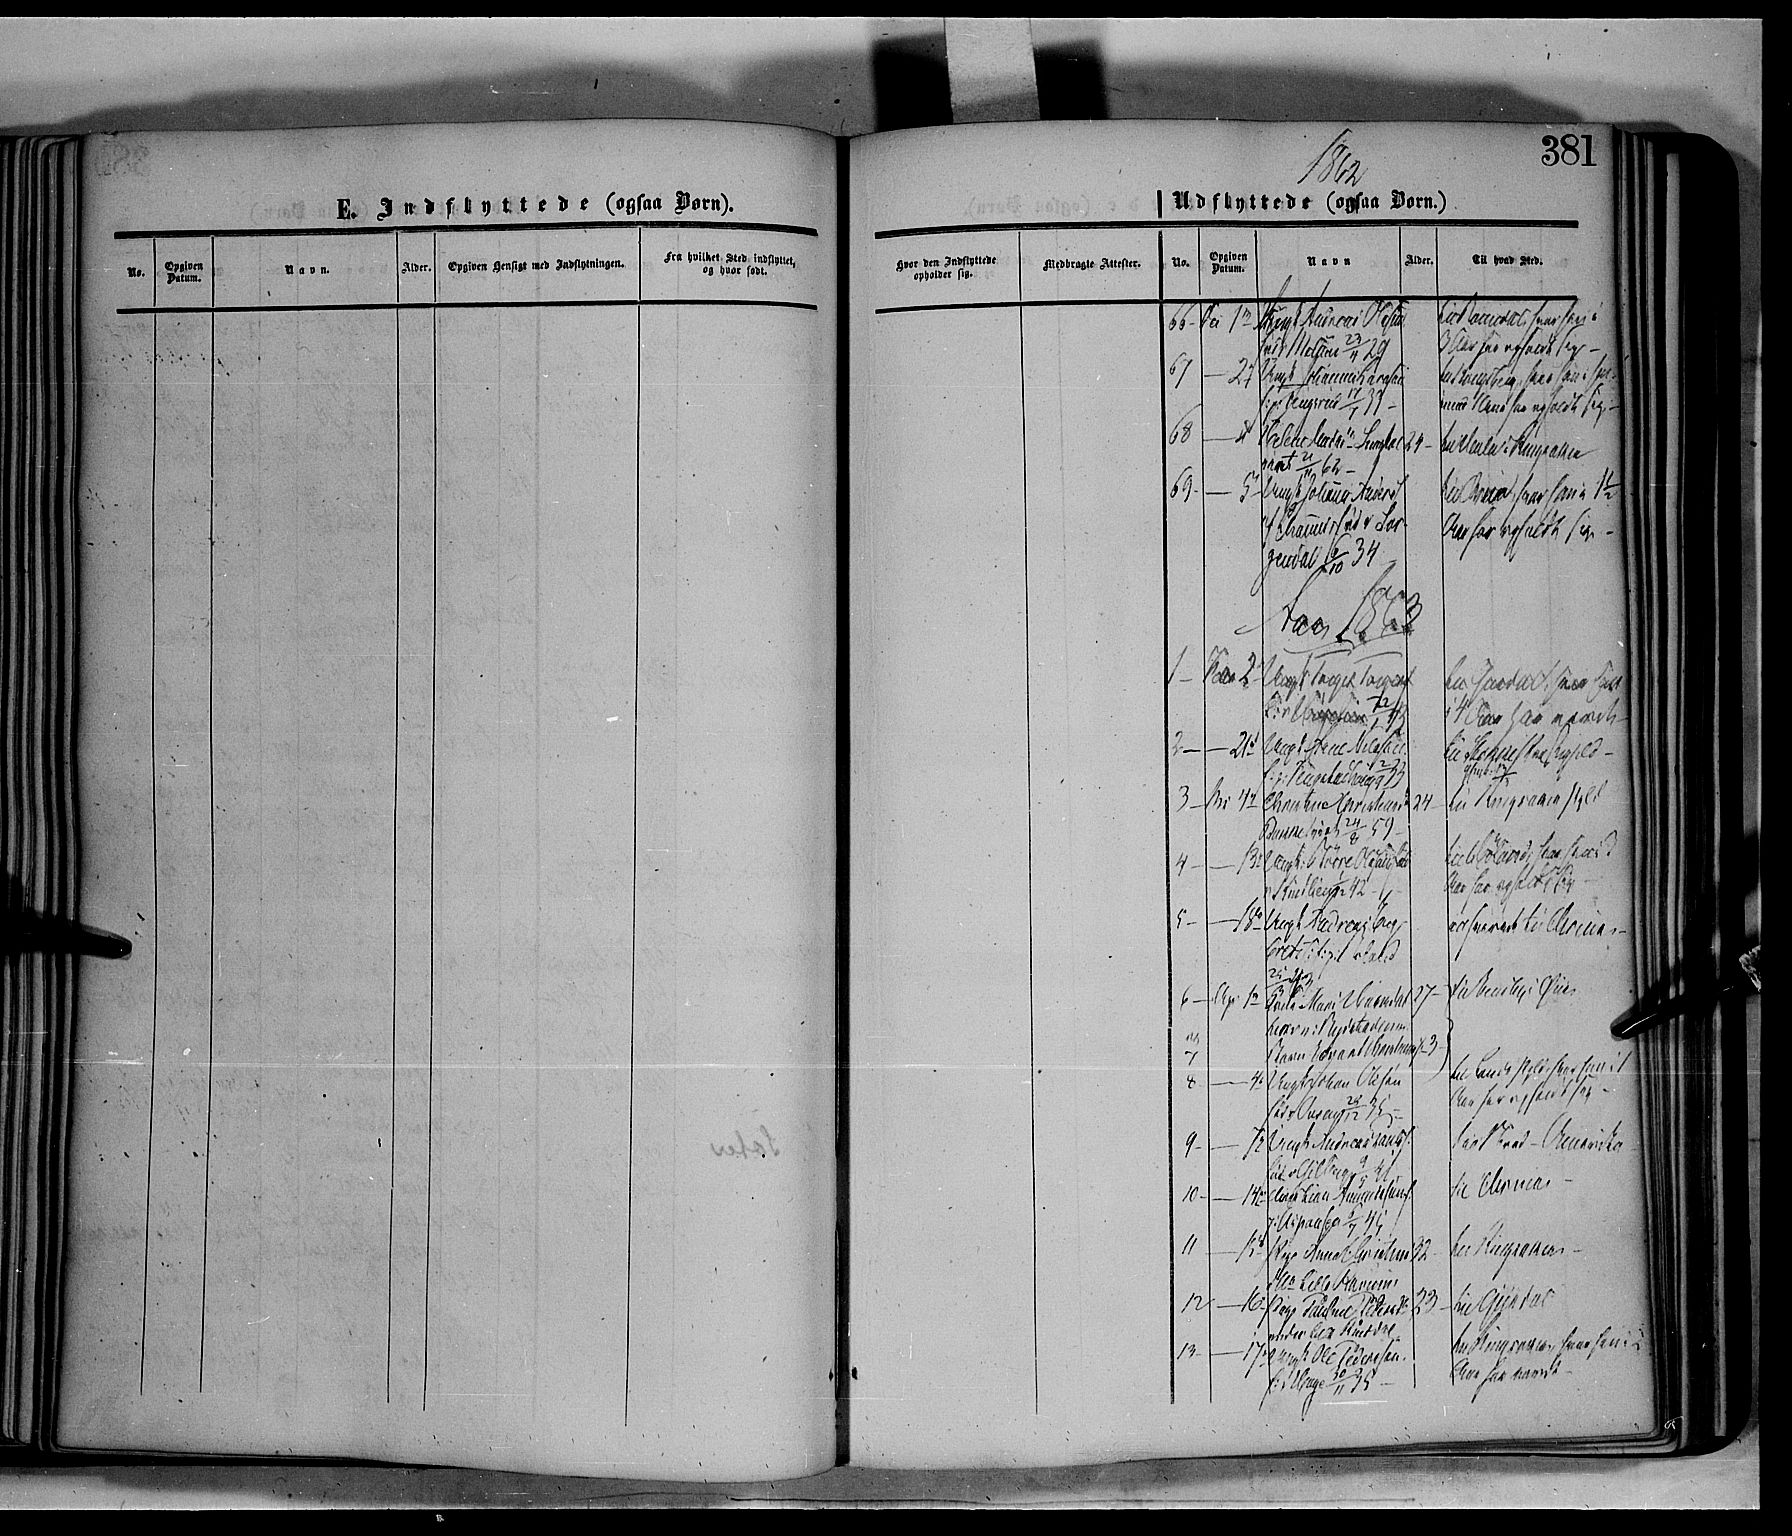 SAH, Fåberg prestekontor, Ministerialbok nr. 6B, 1855-1867, s. 381